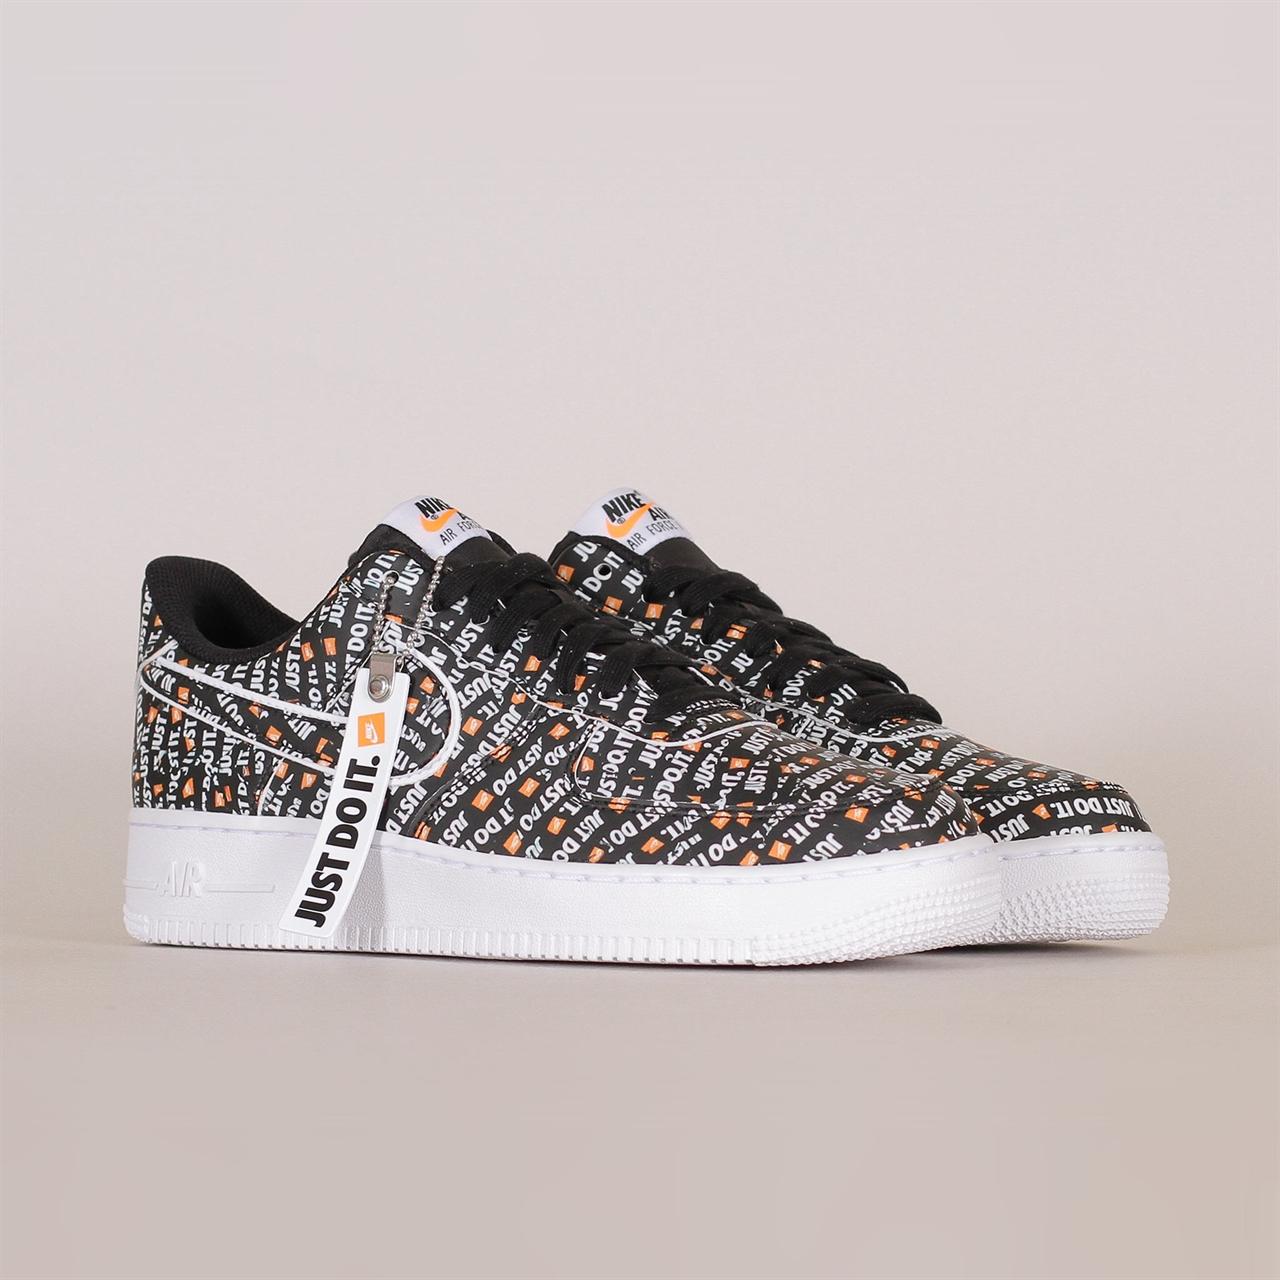 timeless design 7dbea 34405 nike sportswear air force 1 07 lv8 ´just do it´ ao6296 001